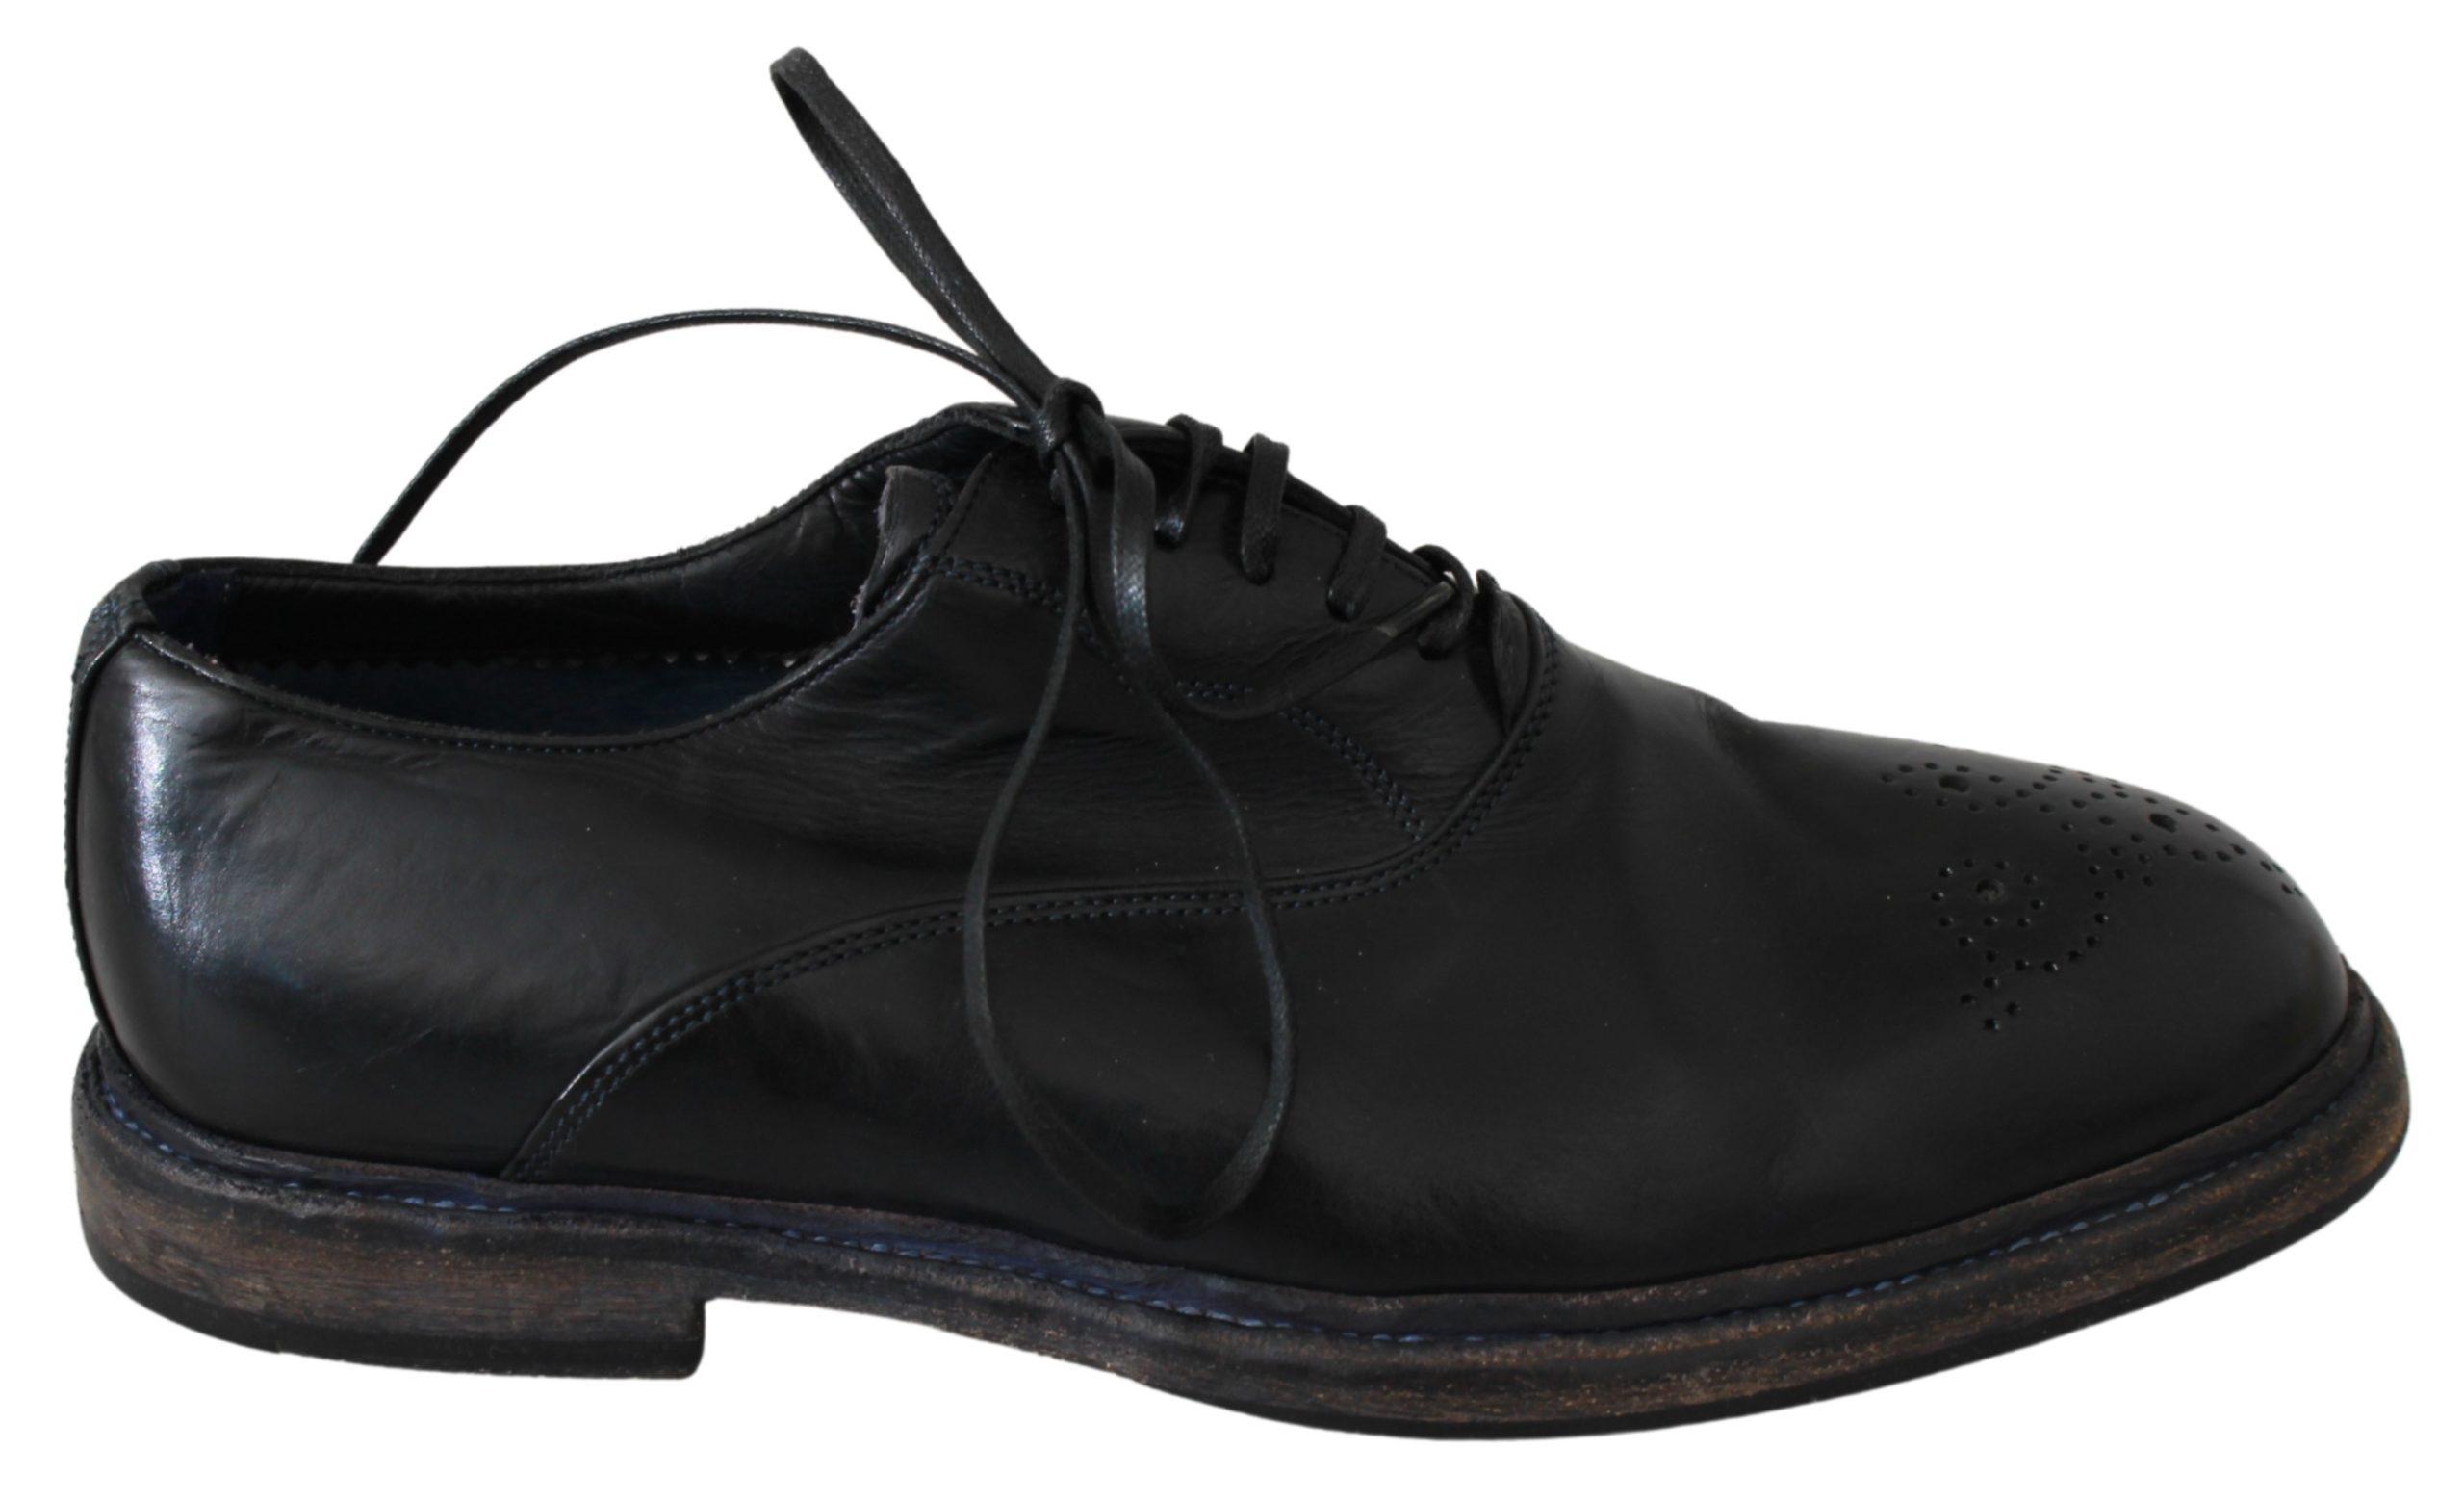 Black Leather Derby Dress Formal Shoes - EU39/US6